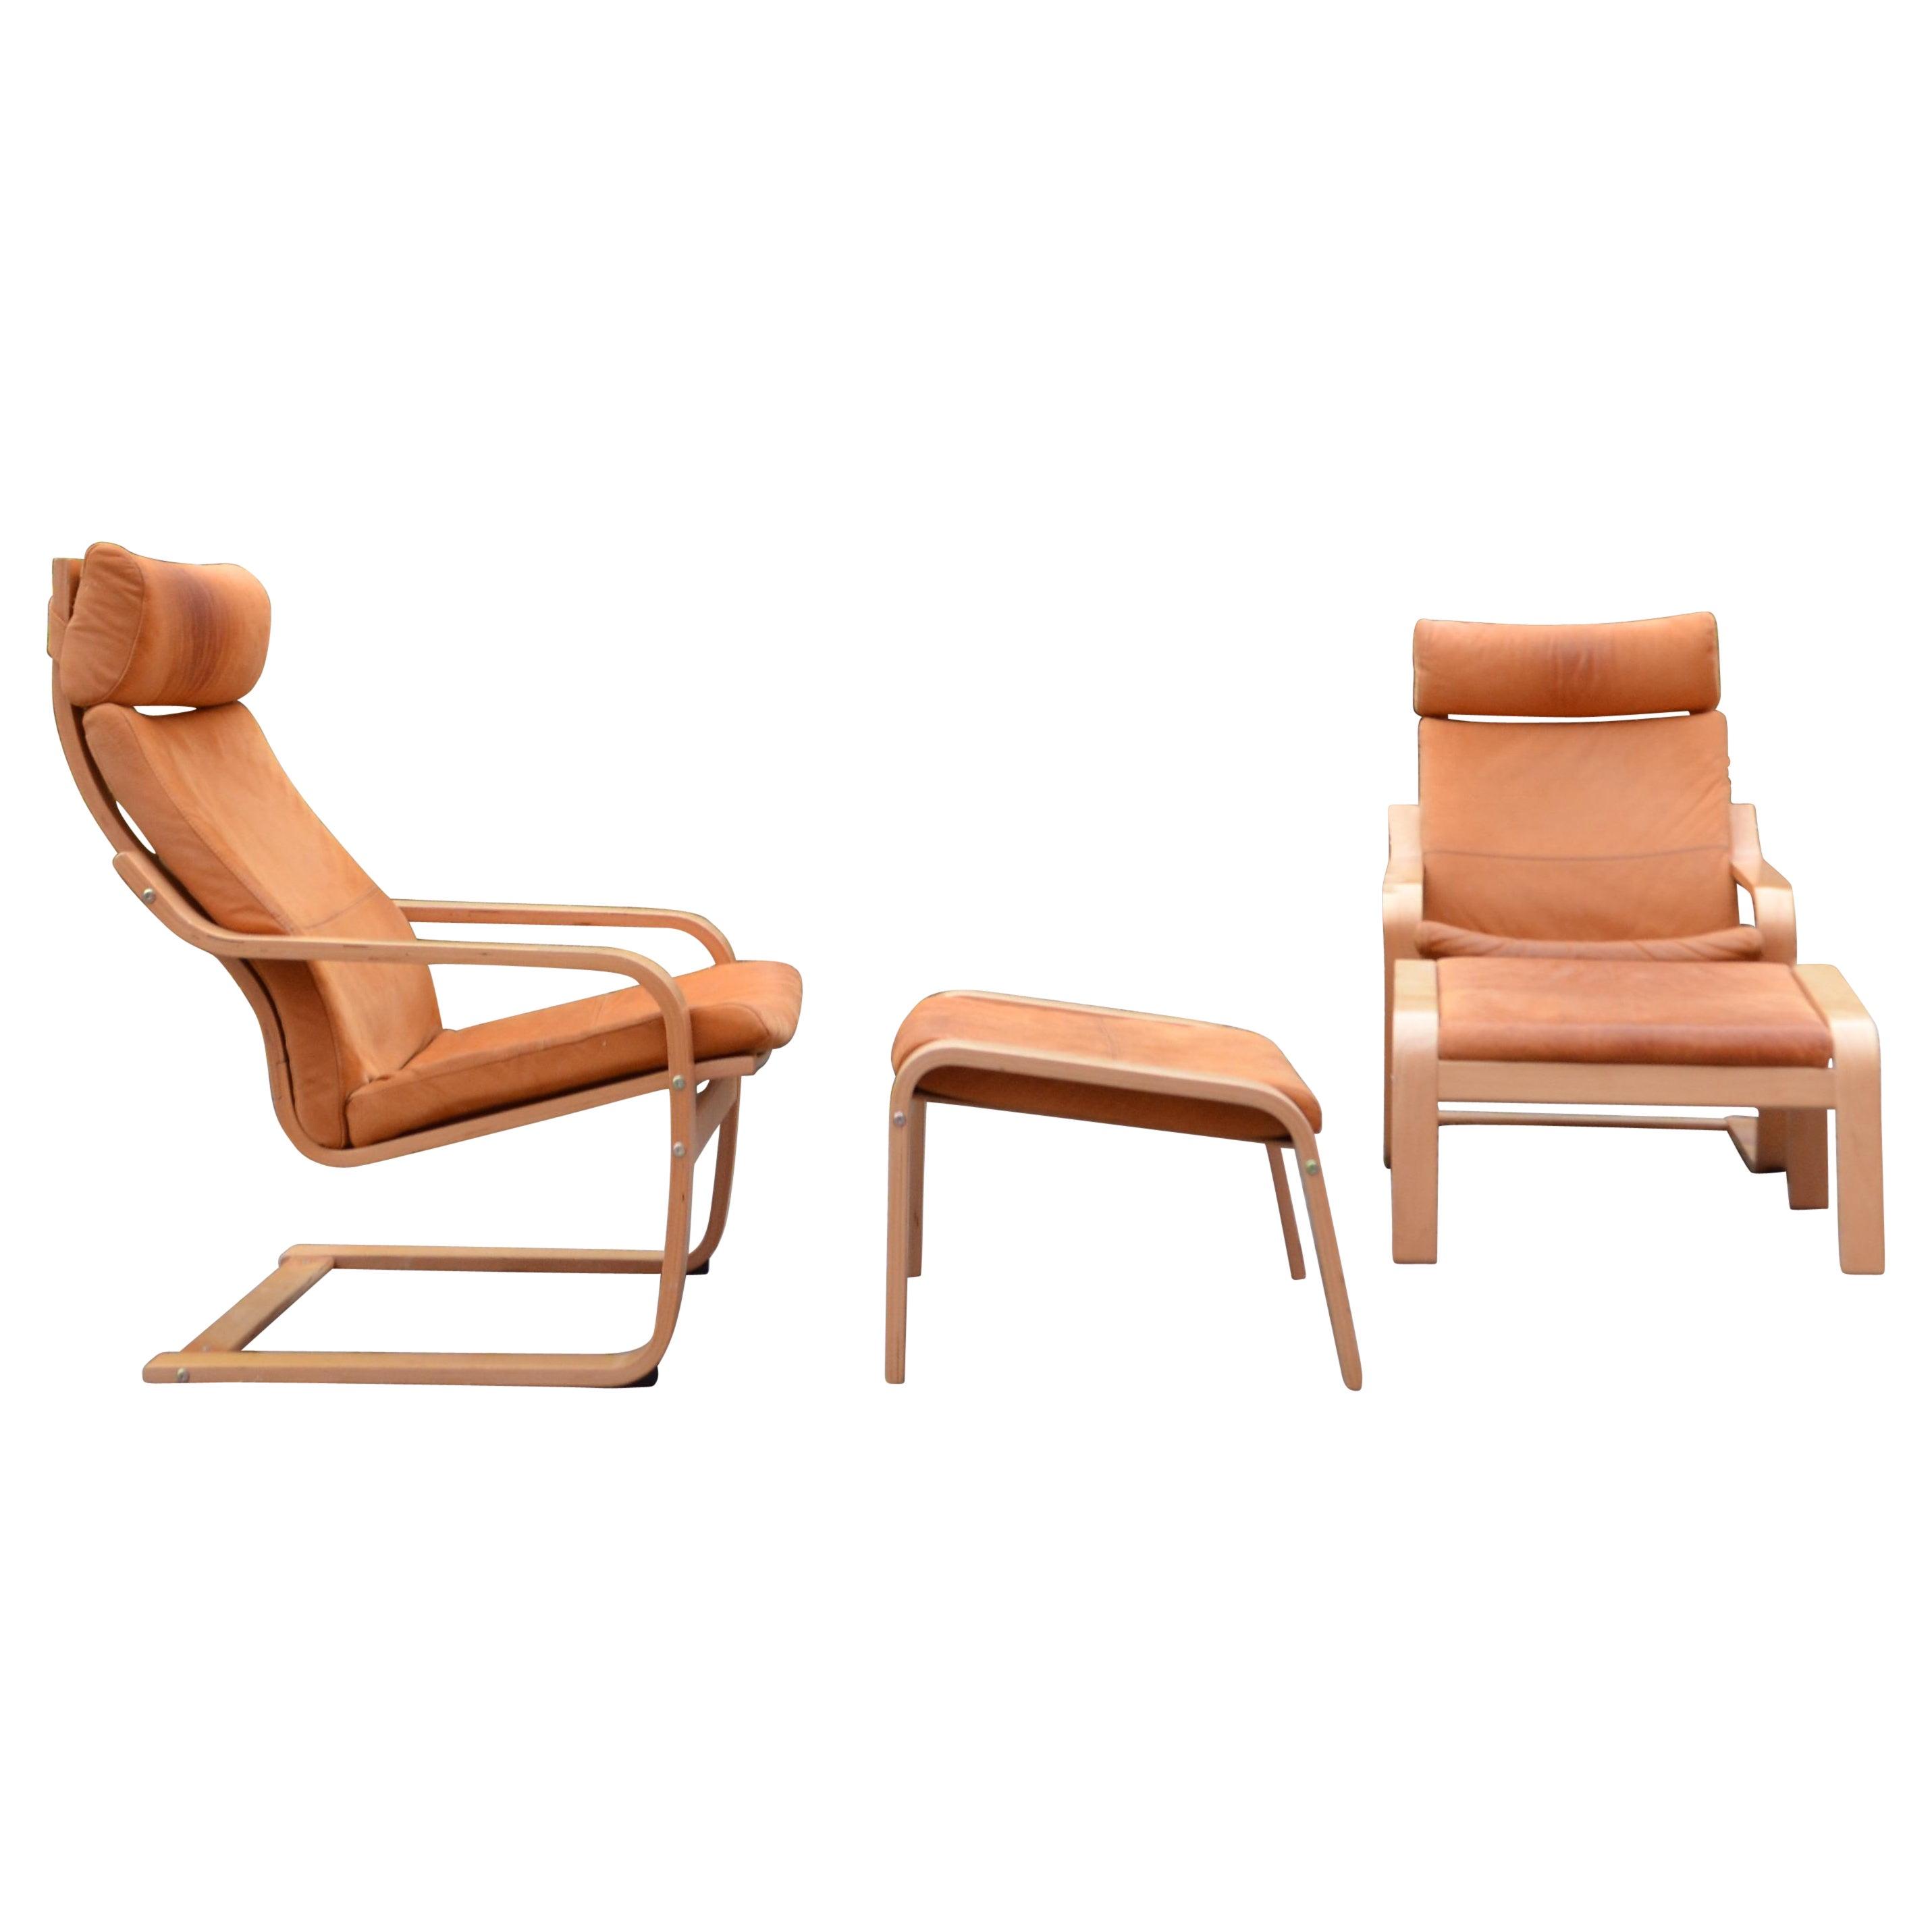 VINTAGE IKEA Poäng Velvet Leather Lounge Chair & Ottomane Noboru Nakamura 1999